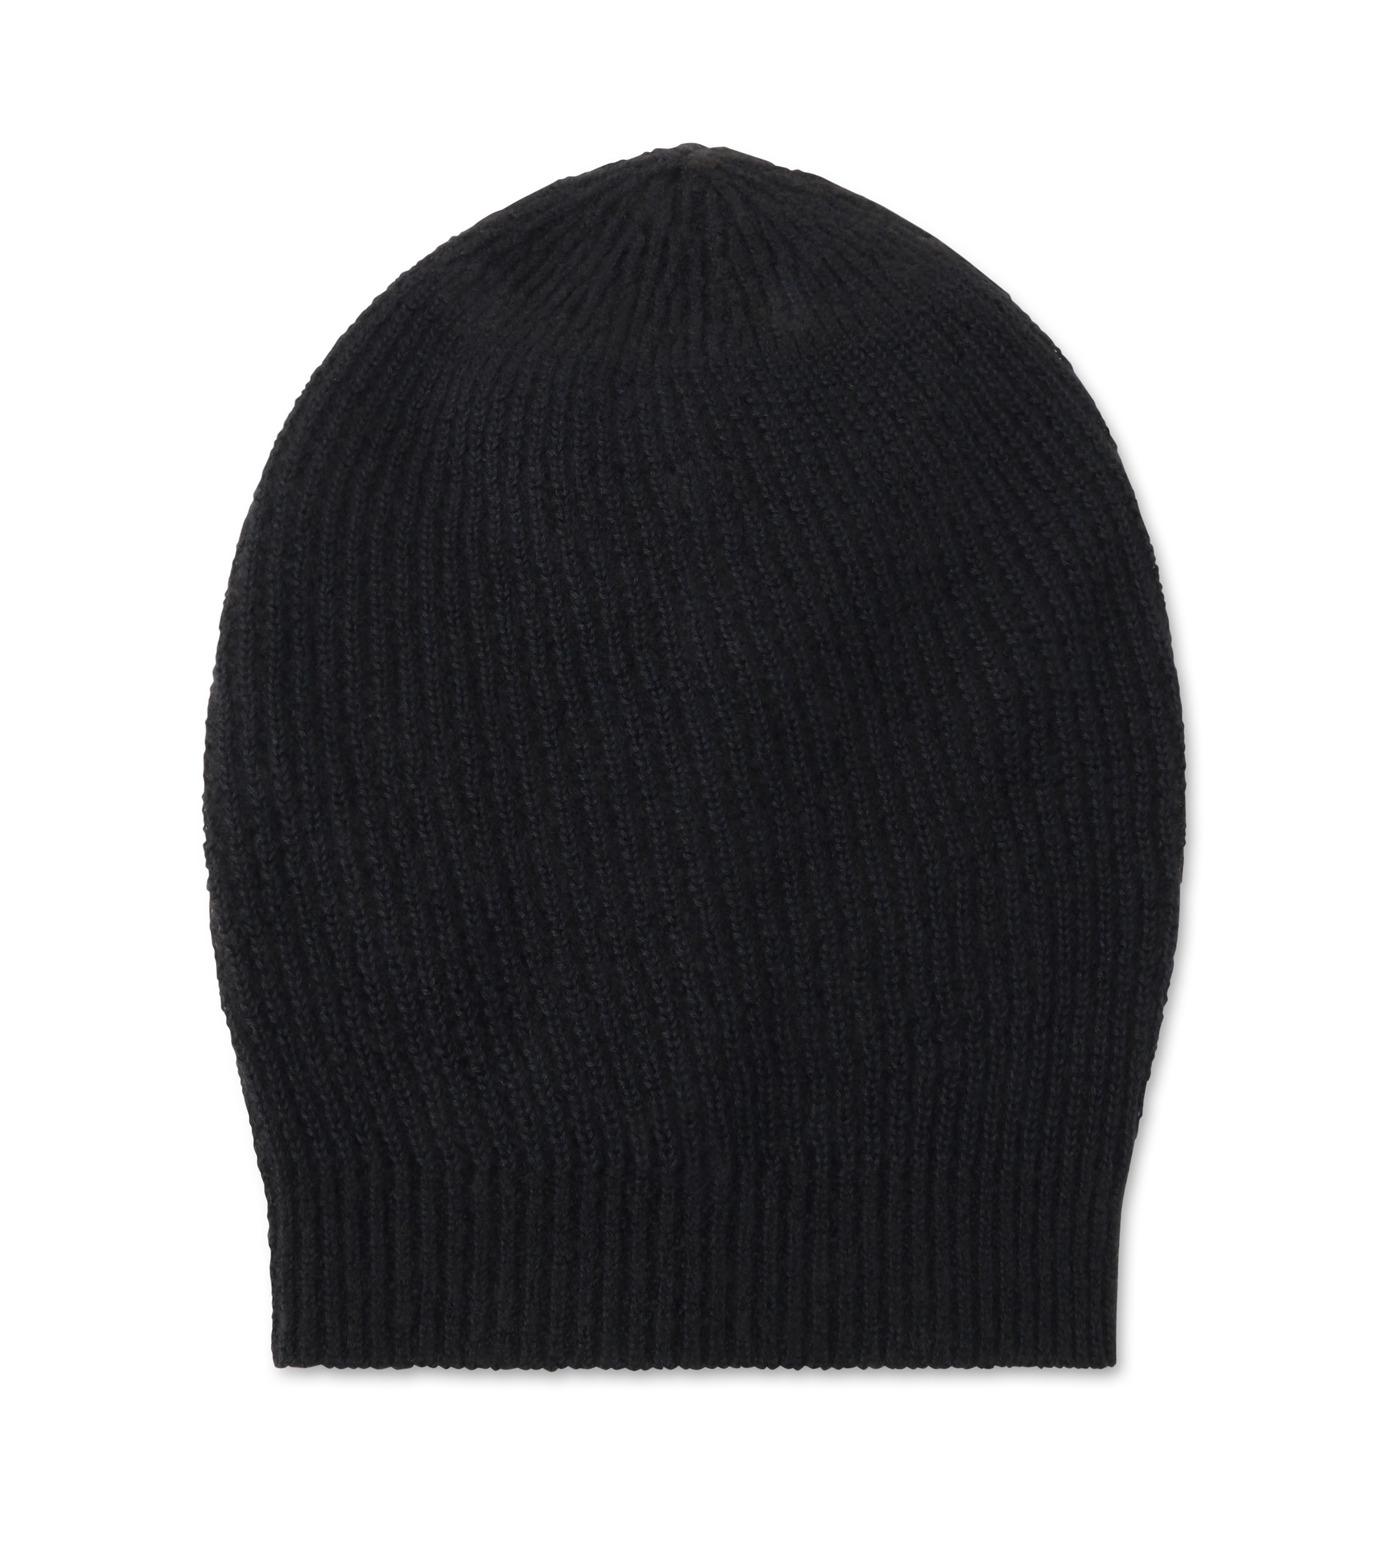 Rick Owens(リックオウエンス)のCashmere Knitcap-BLACK(キャップ/cap)-RU16F6494WSL-13 拡大詳細画像1